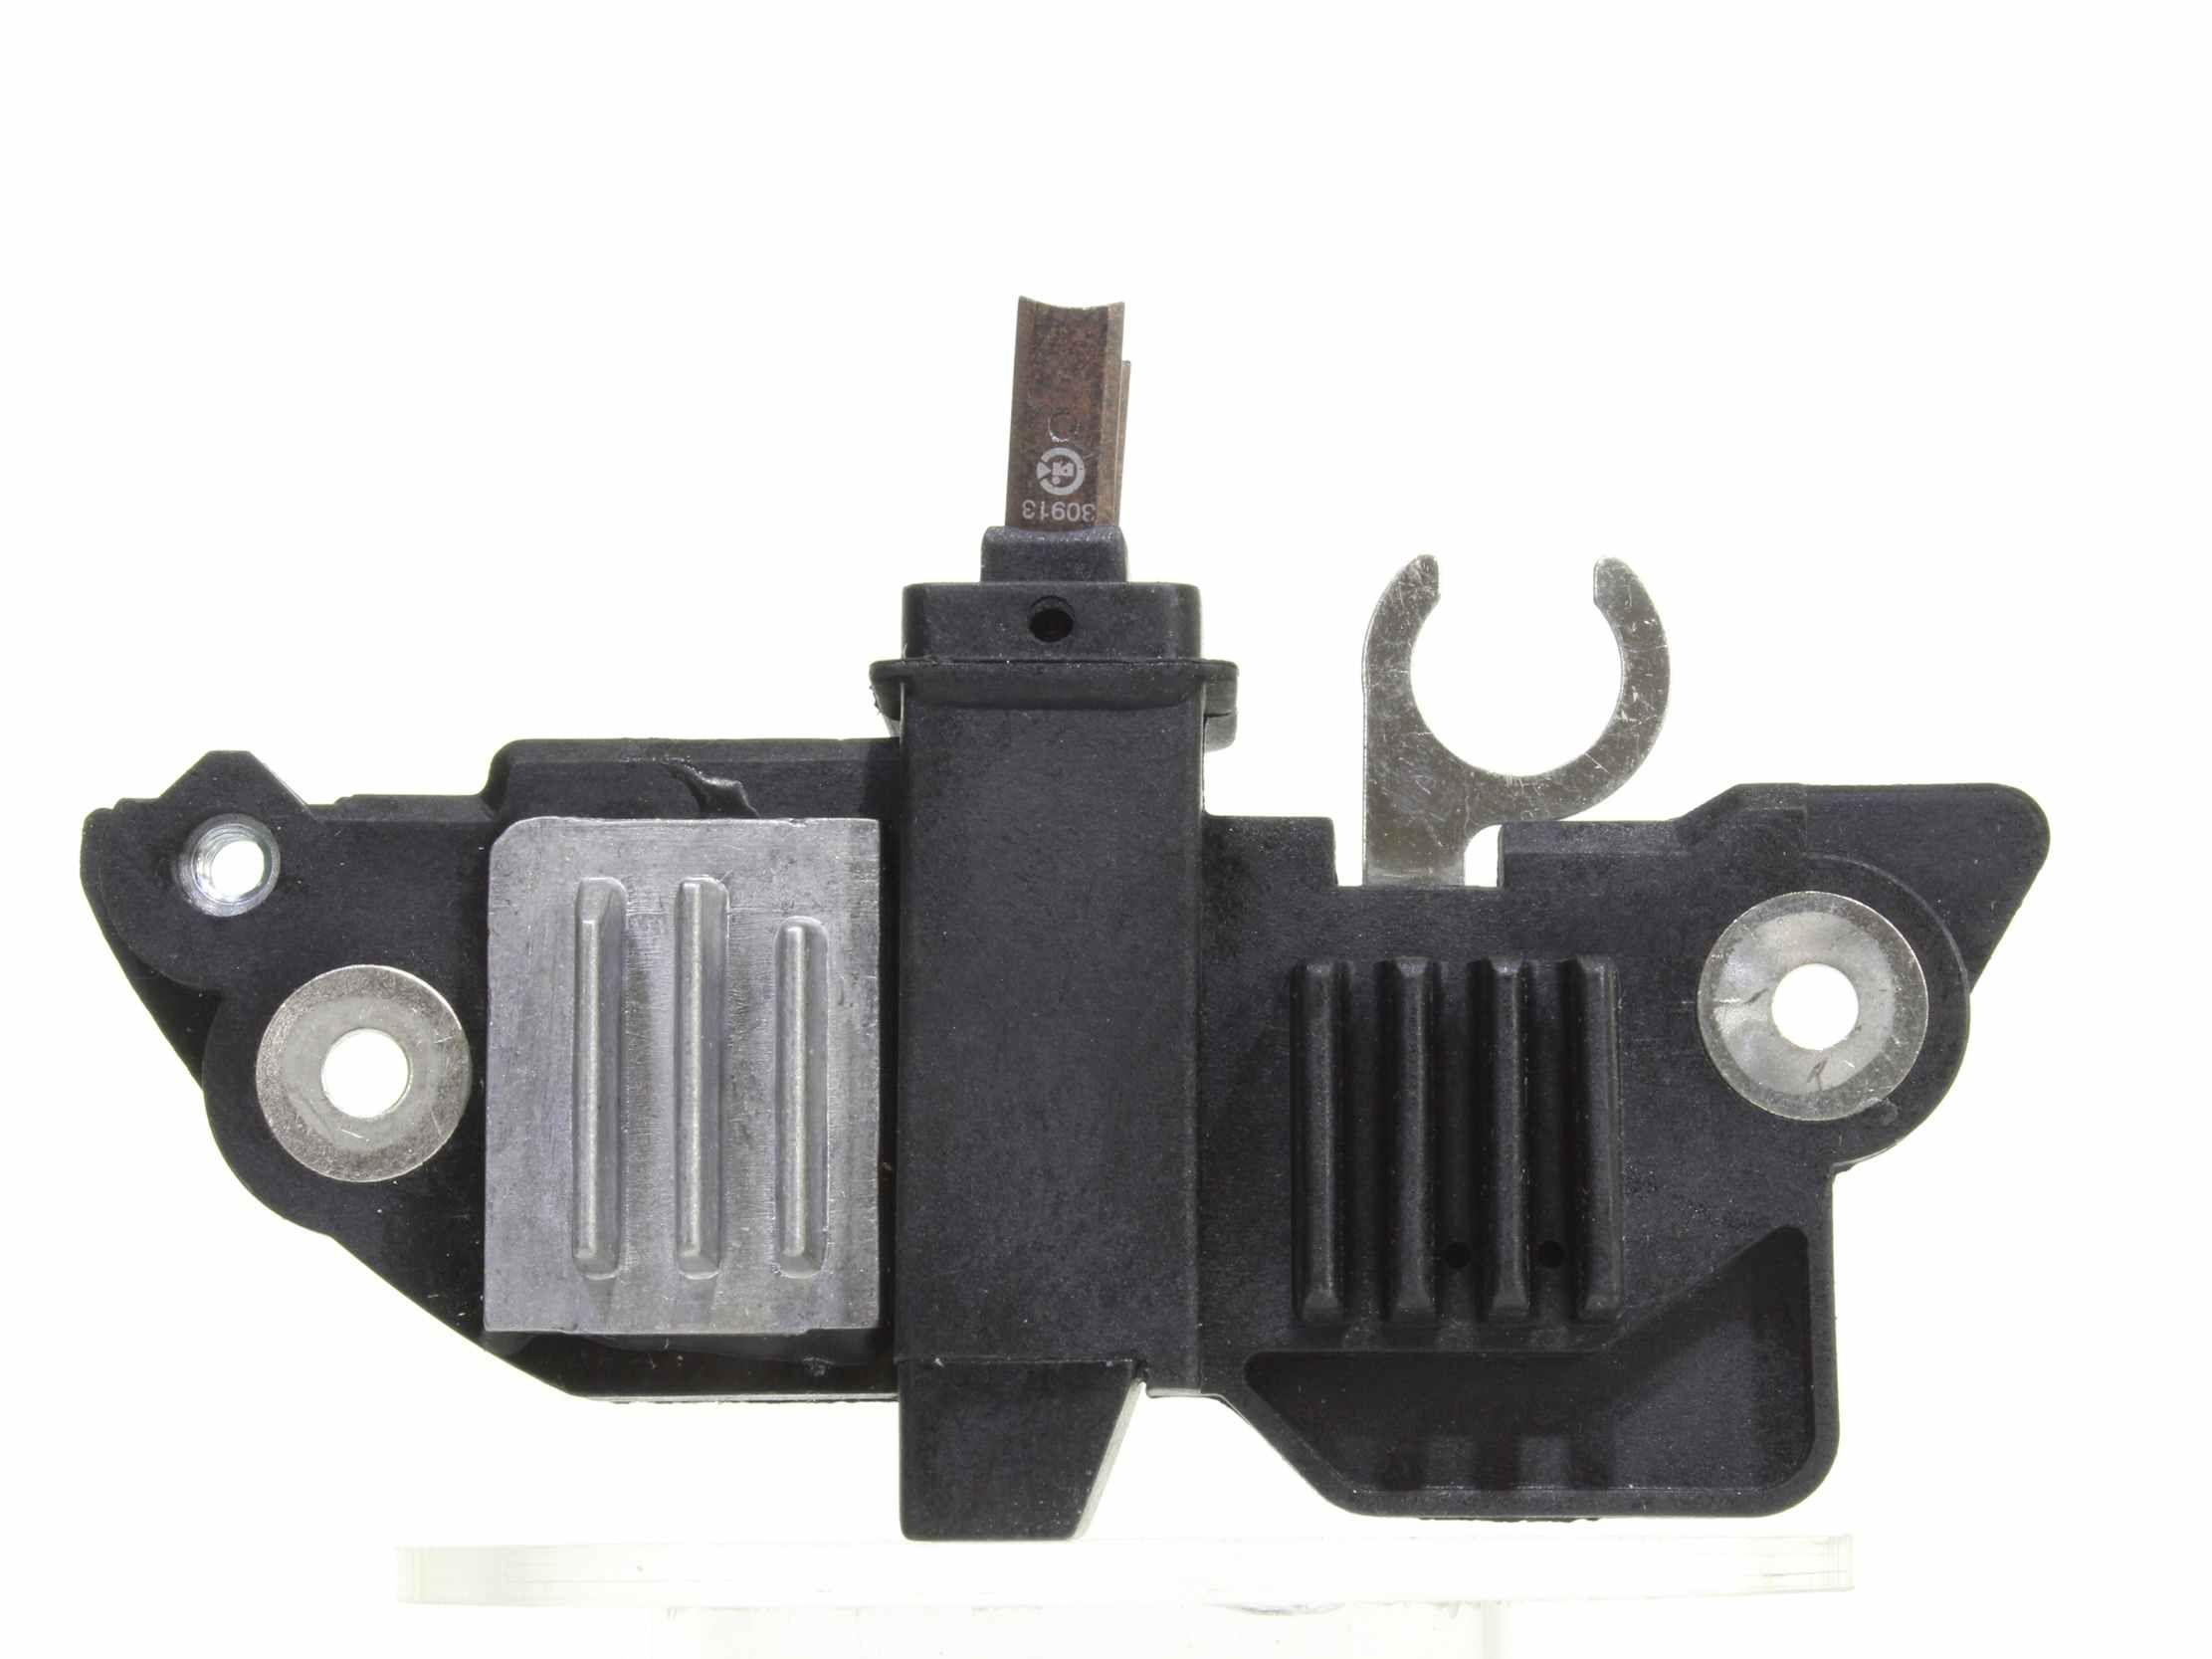 AUDI A6 2012 Generatorregler - Original ALANKO 10700241